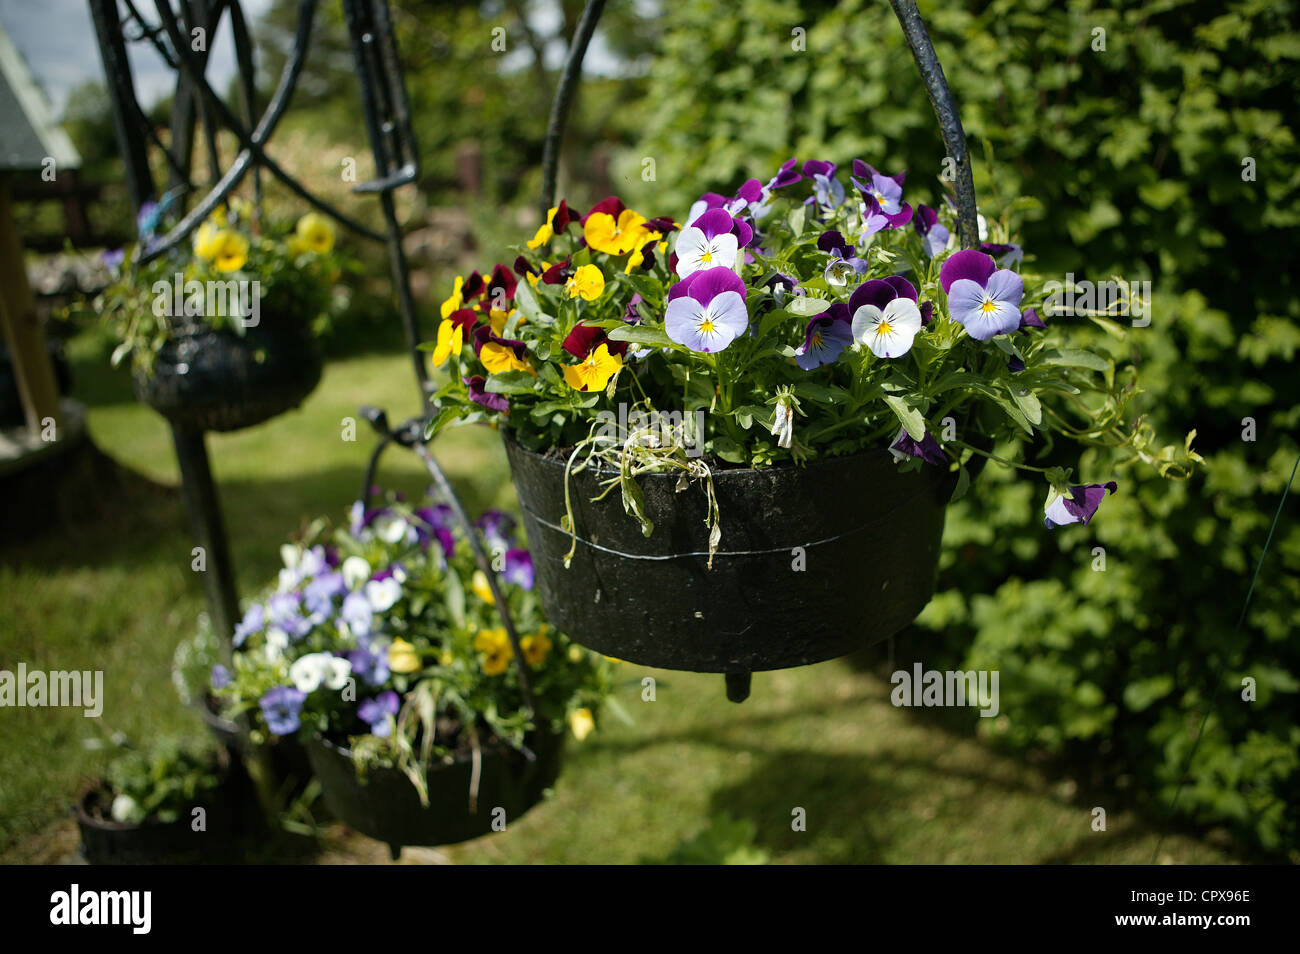 In Pansies appeso un ghisa pentola in un ambiente da giardino. Giallo, bianco, viola. Tre vasi sospesi Foto Stock